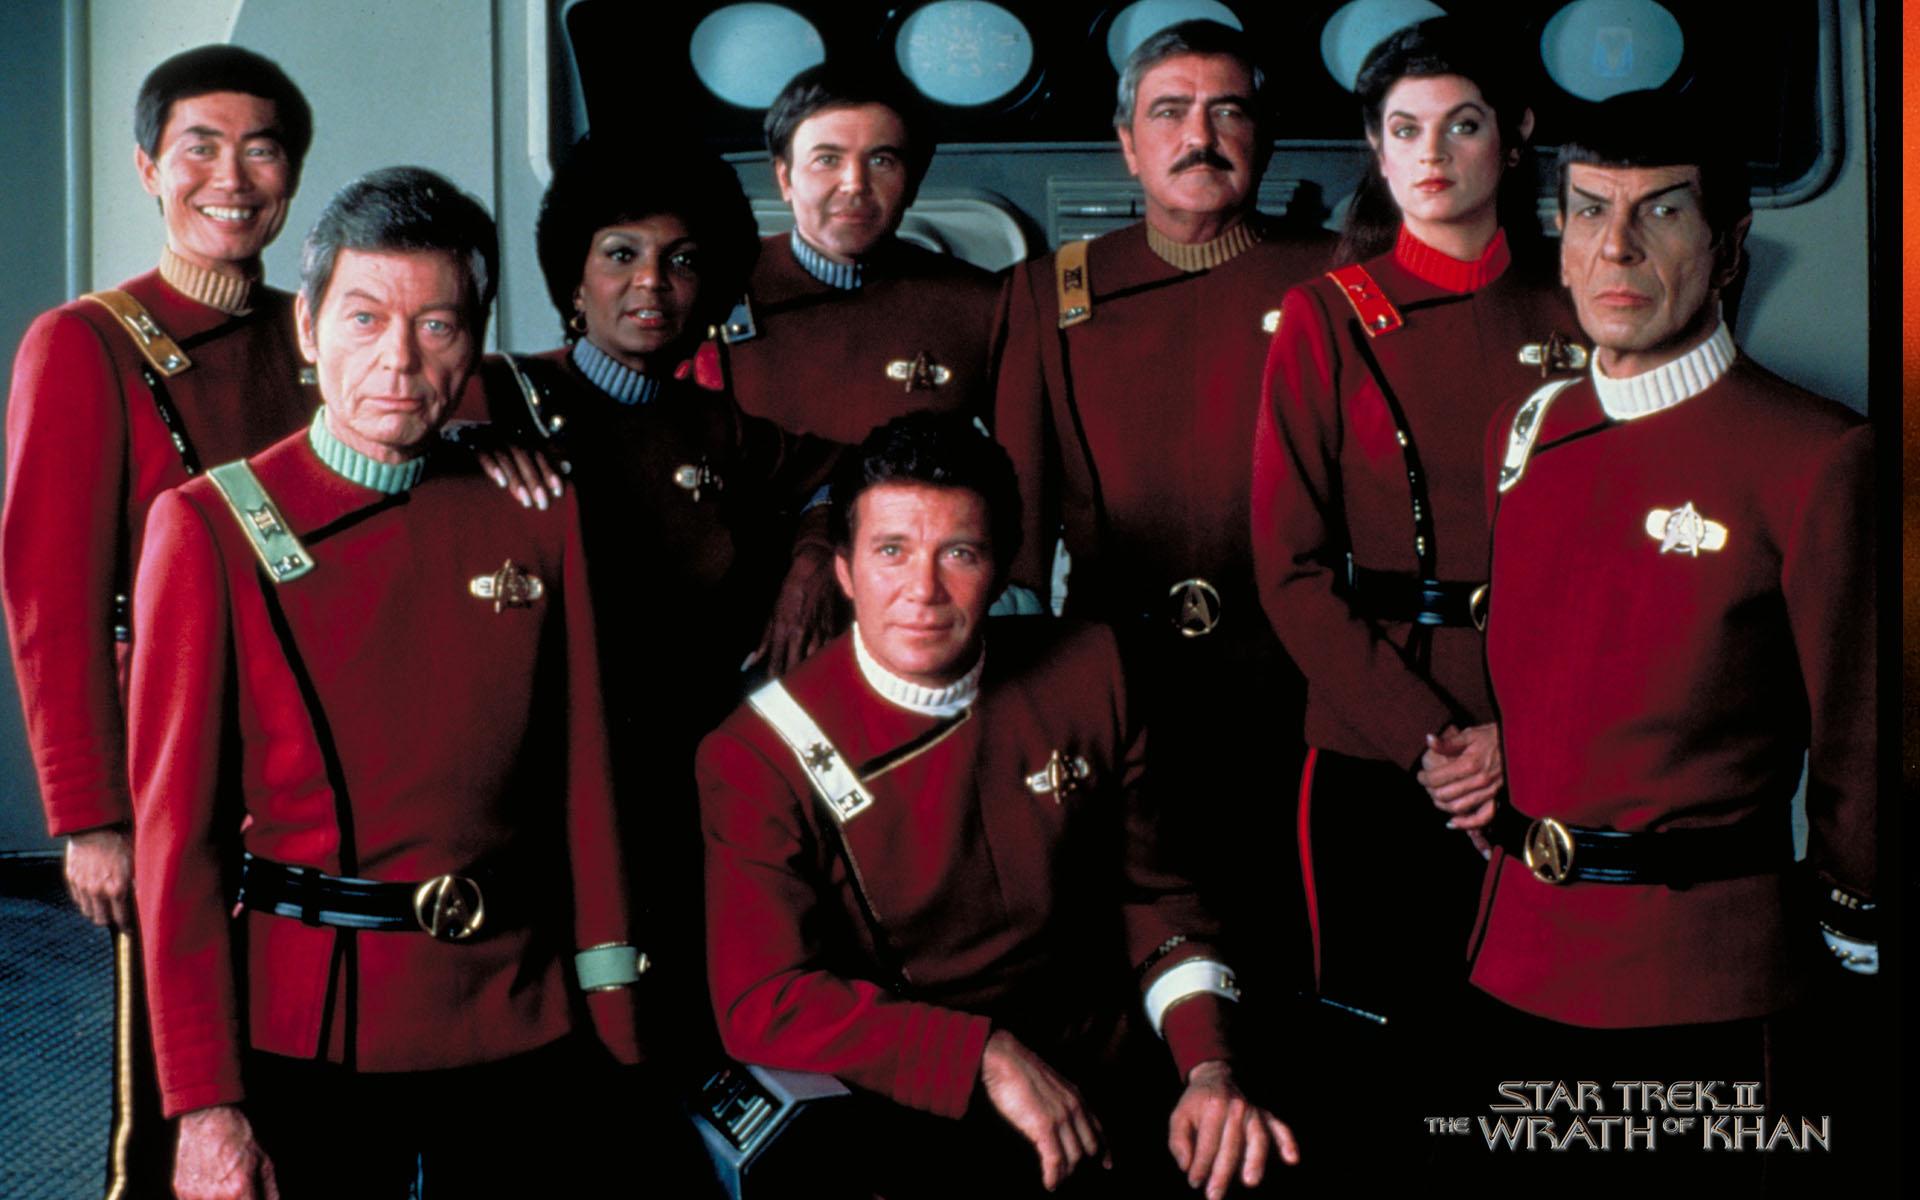 The greatest Star Trek uniforms.